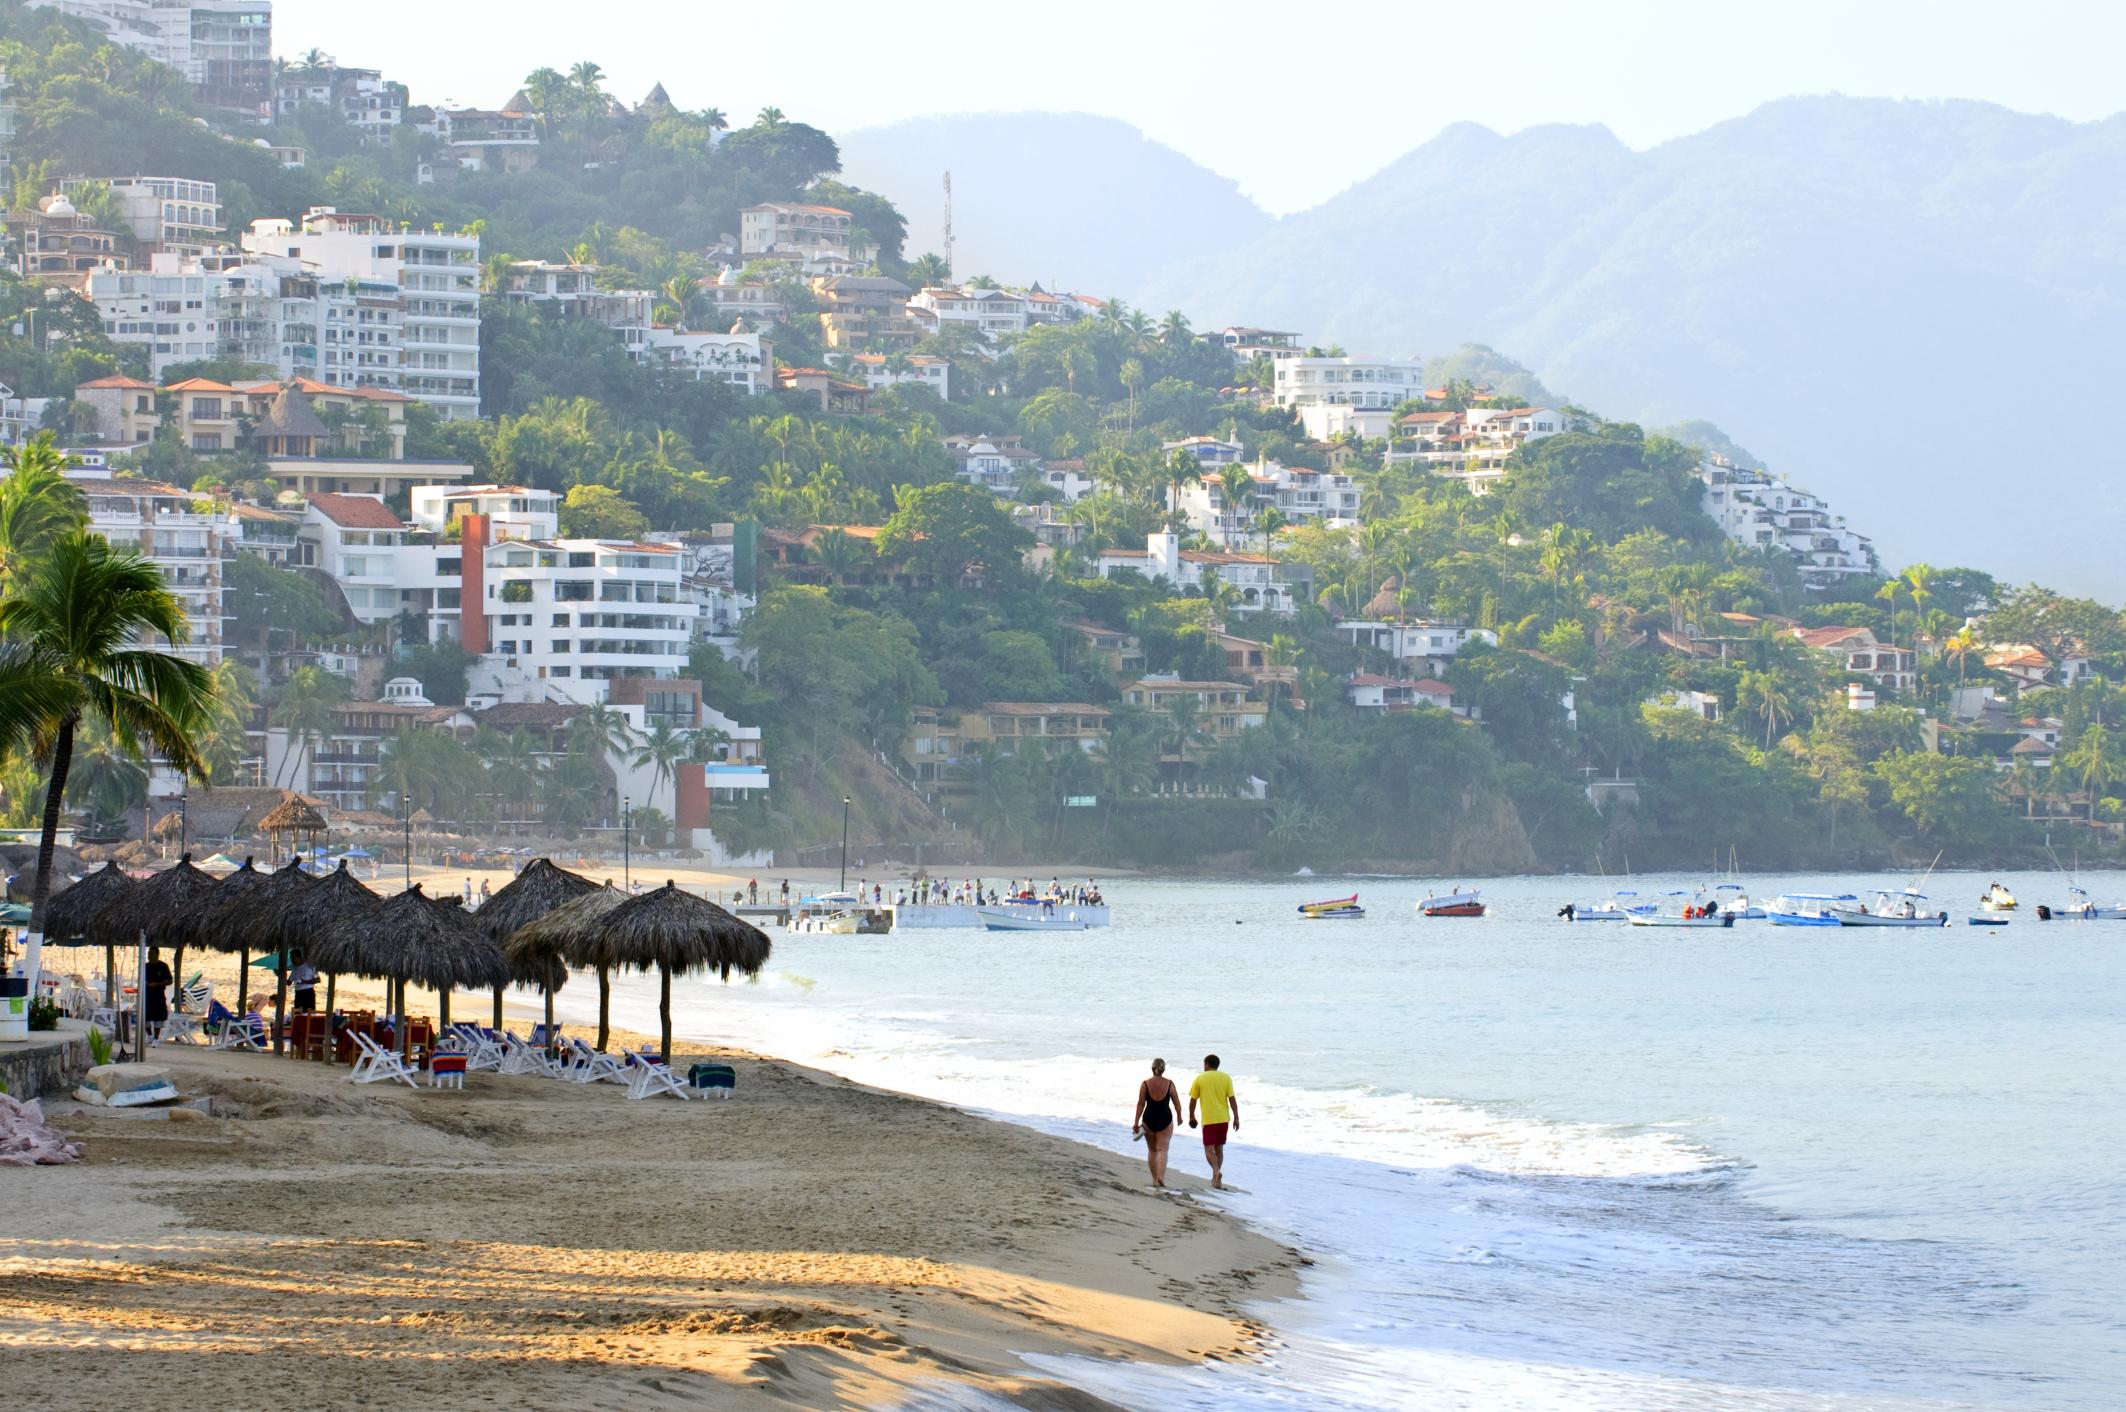 The Romantic Zone and Los Muertos Beach